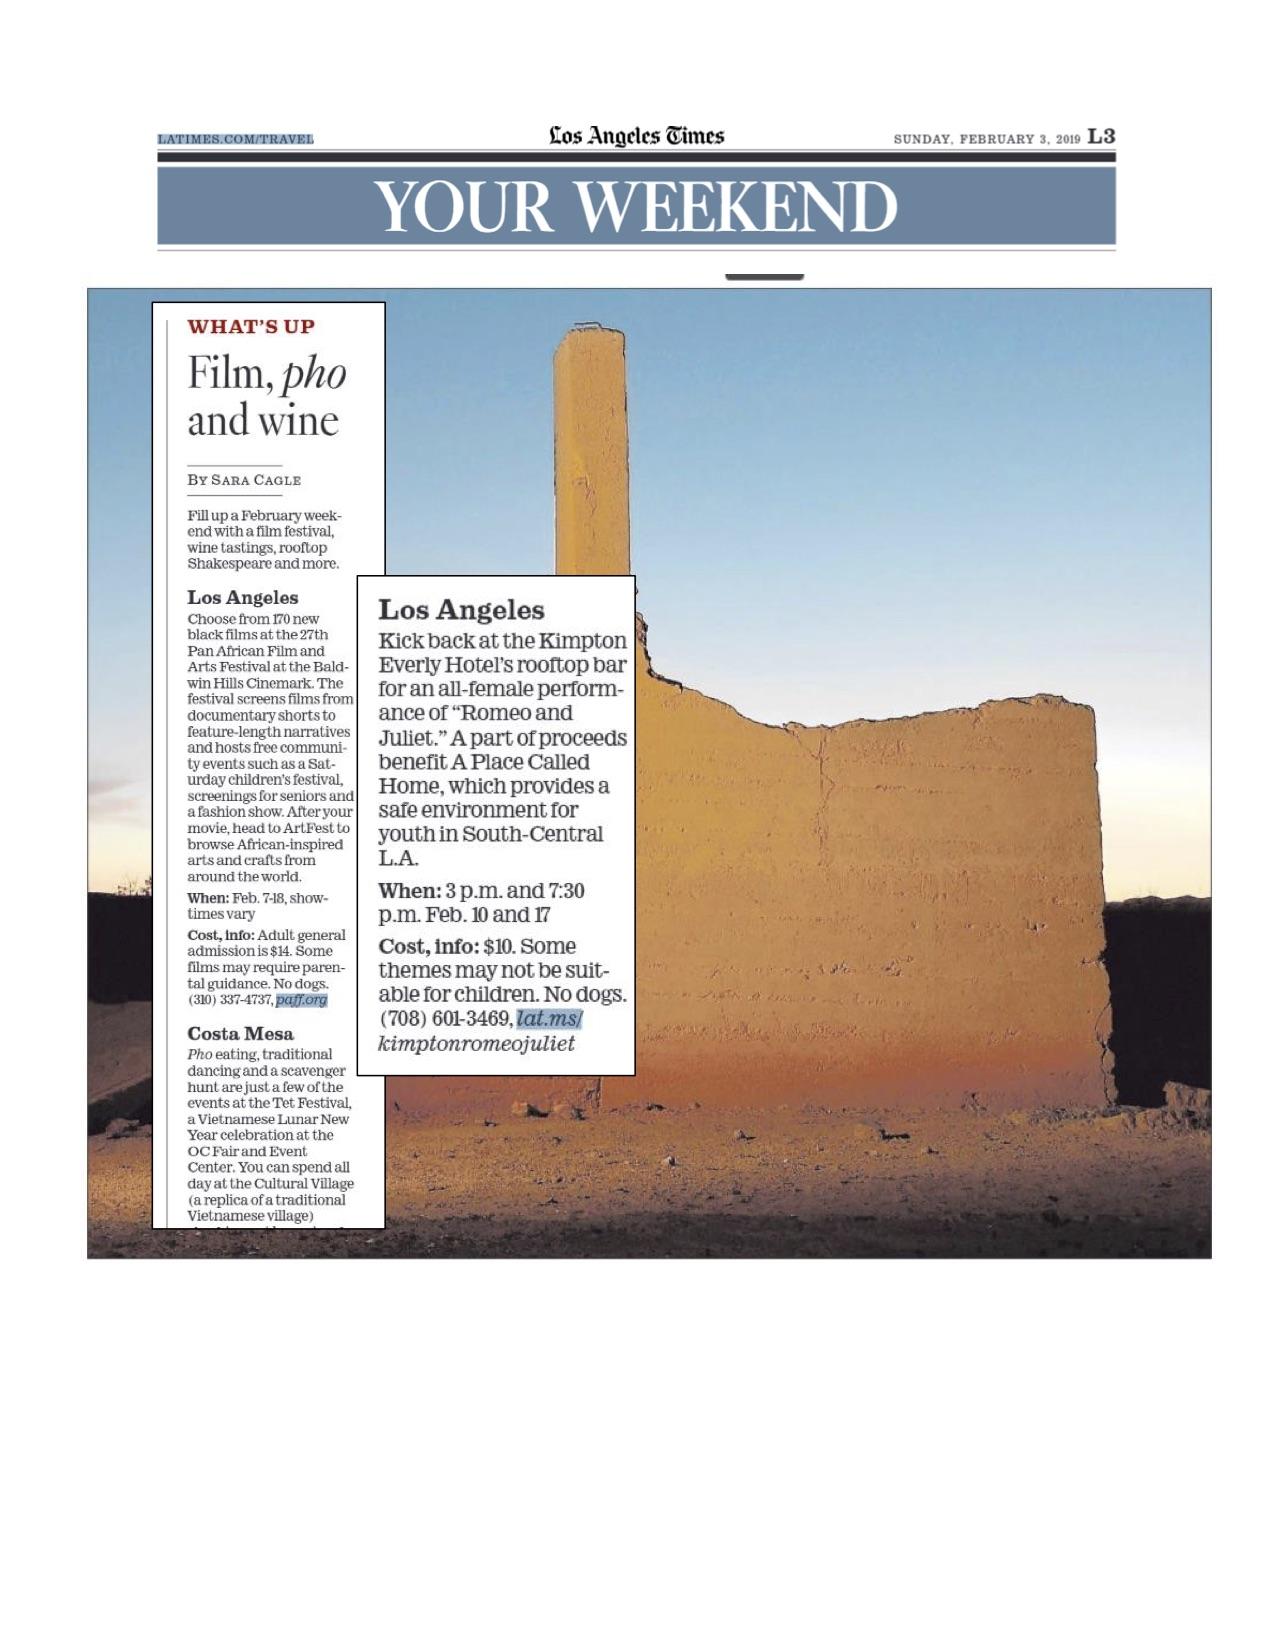 Kimpton_Los Angeles Times .jpg